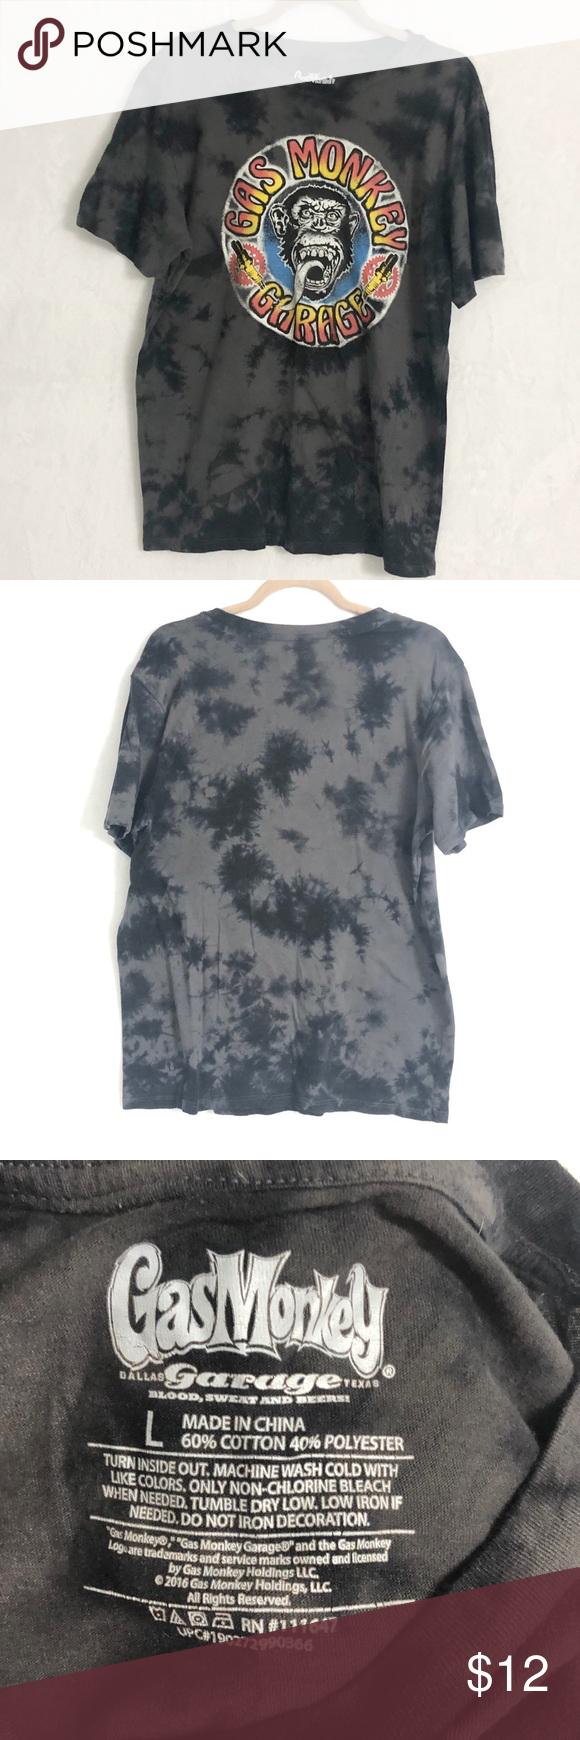 Gas Monkey Garage T-shirt size L Tie dye design with Gas Monkey logo  EUC Size L Gas Monkey Garage Shirts Tees - Short Sleeve #gasmonkeygarage